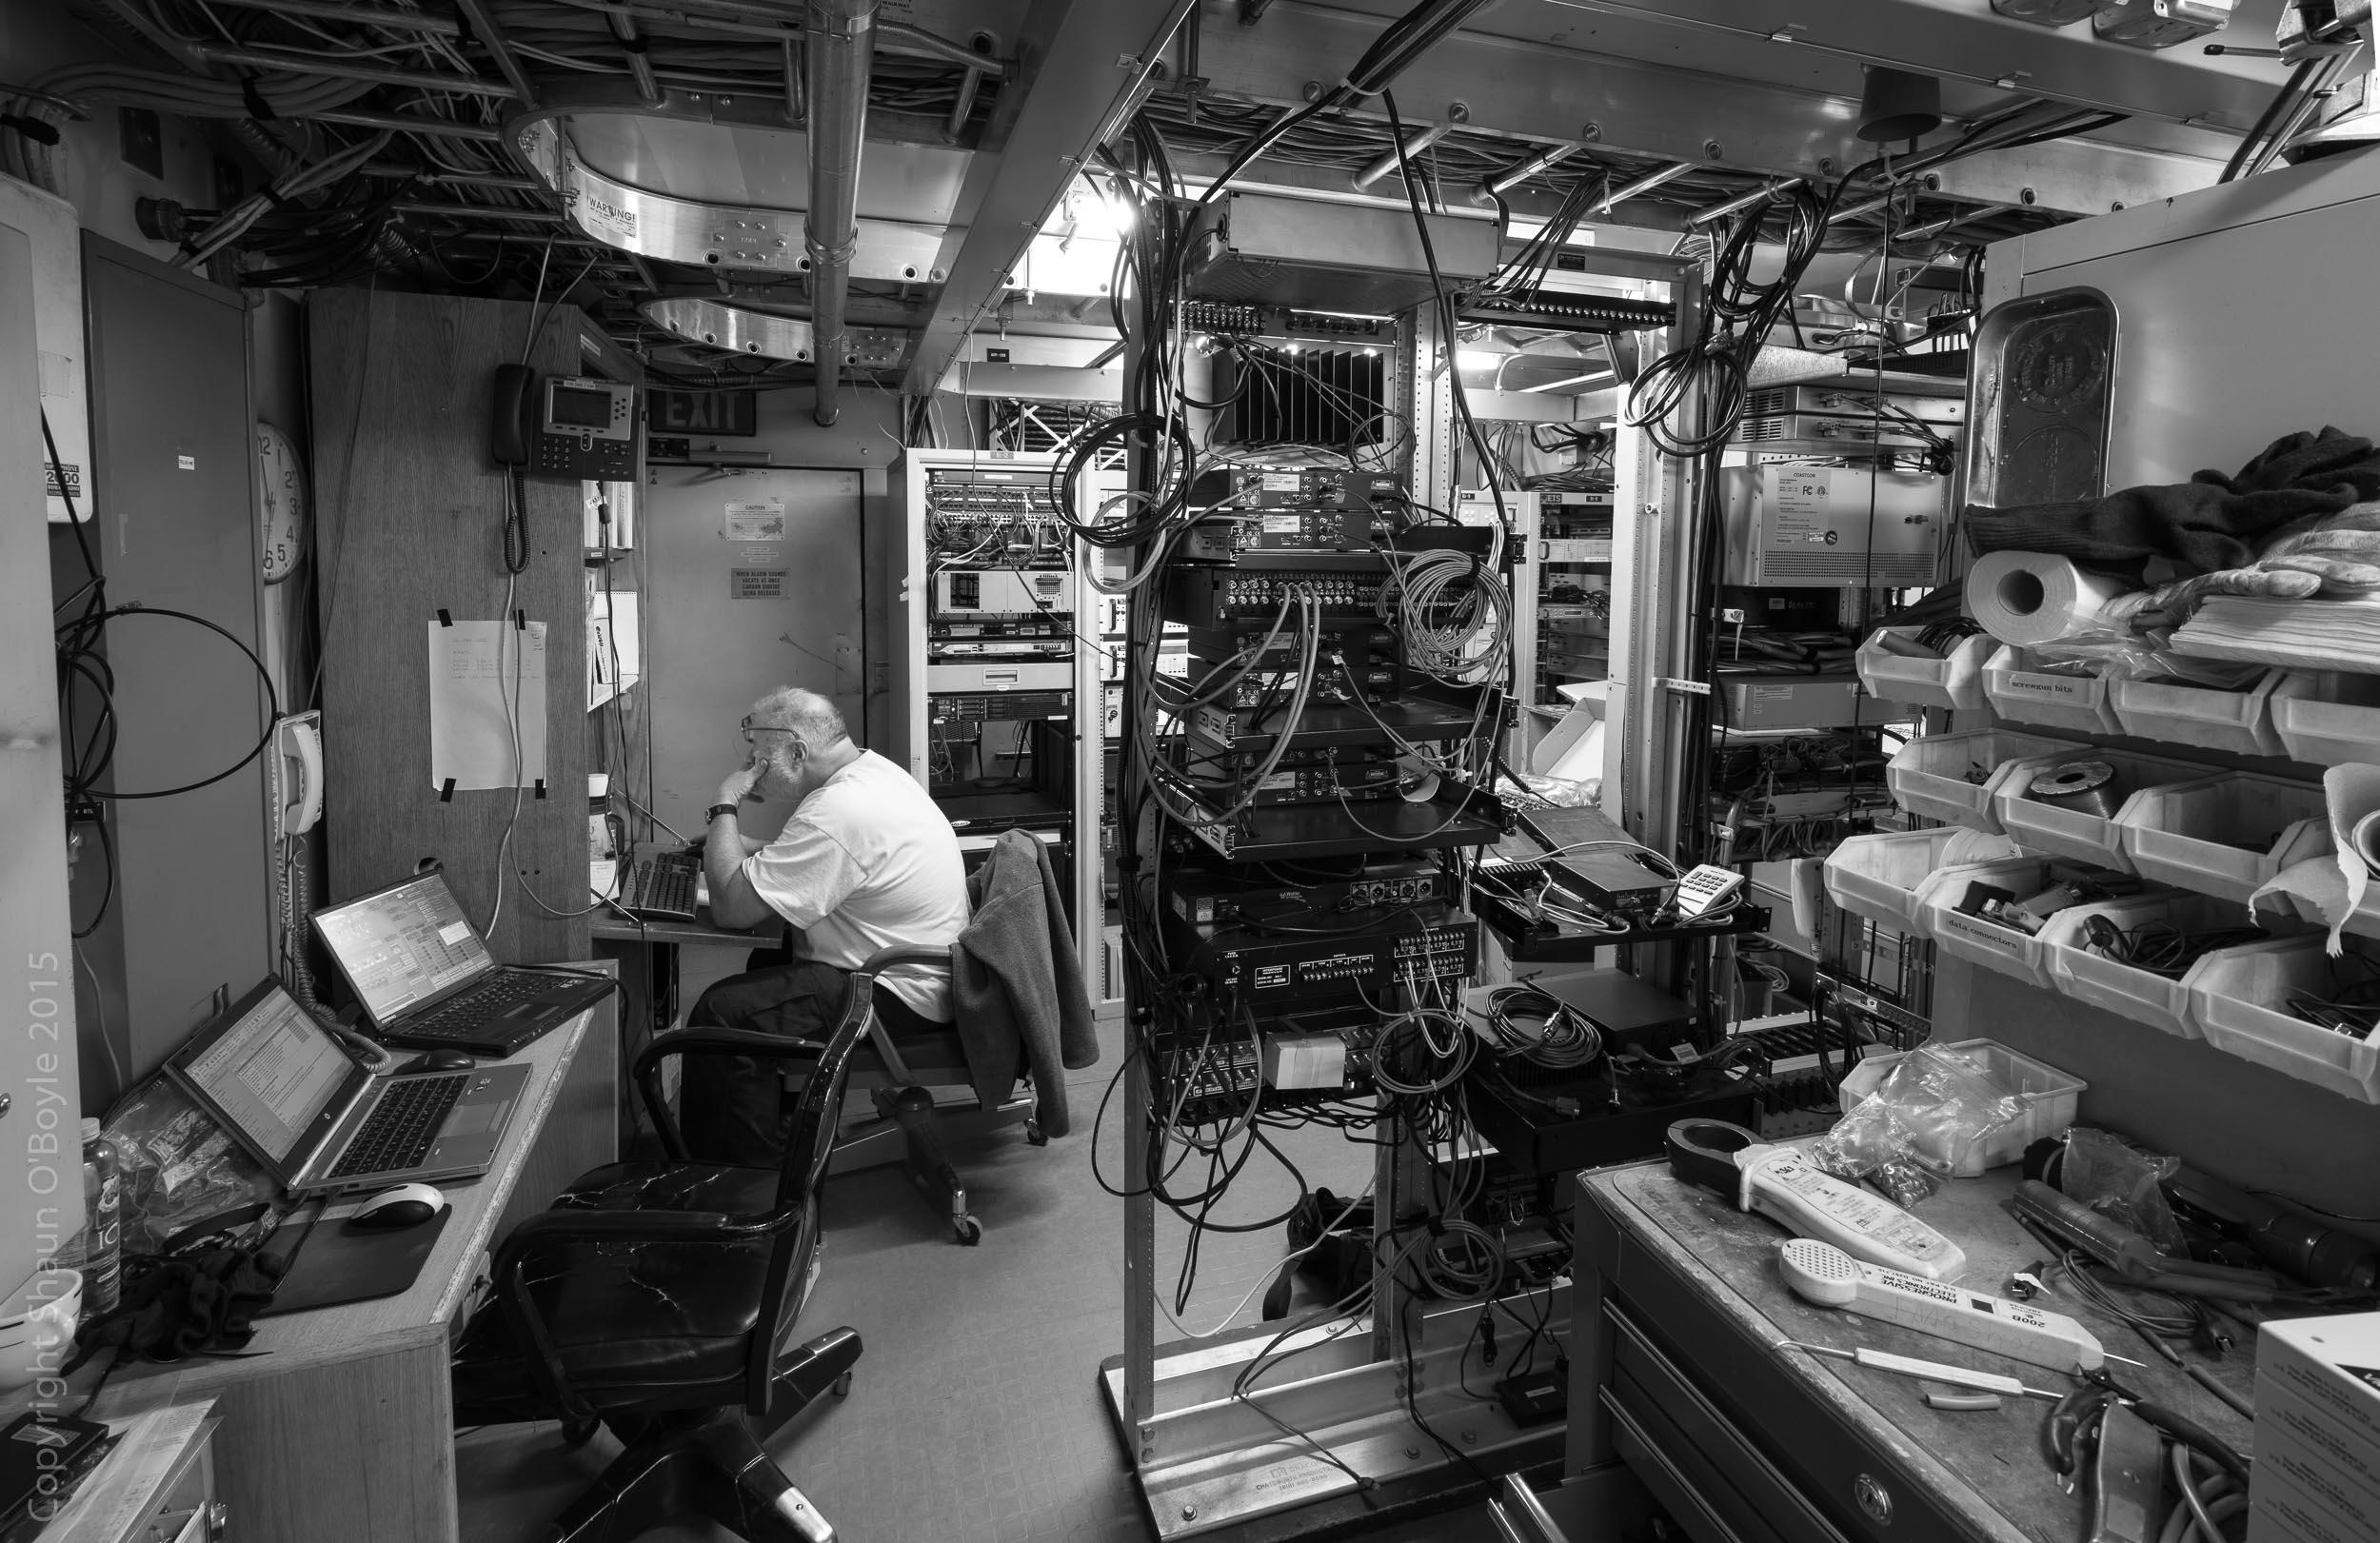 Ken Kloppenborg Satellite Communications Engineer